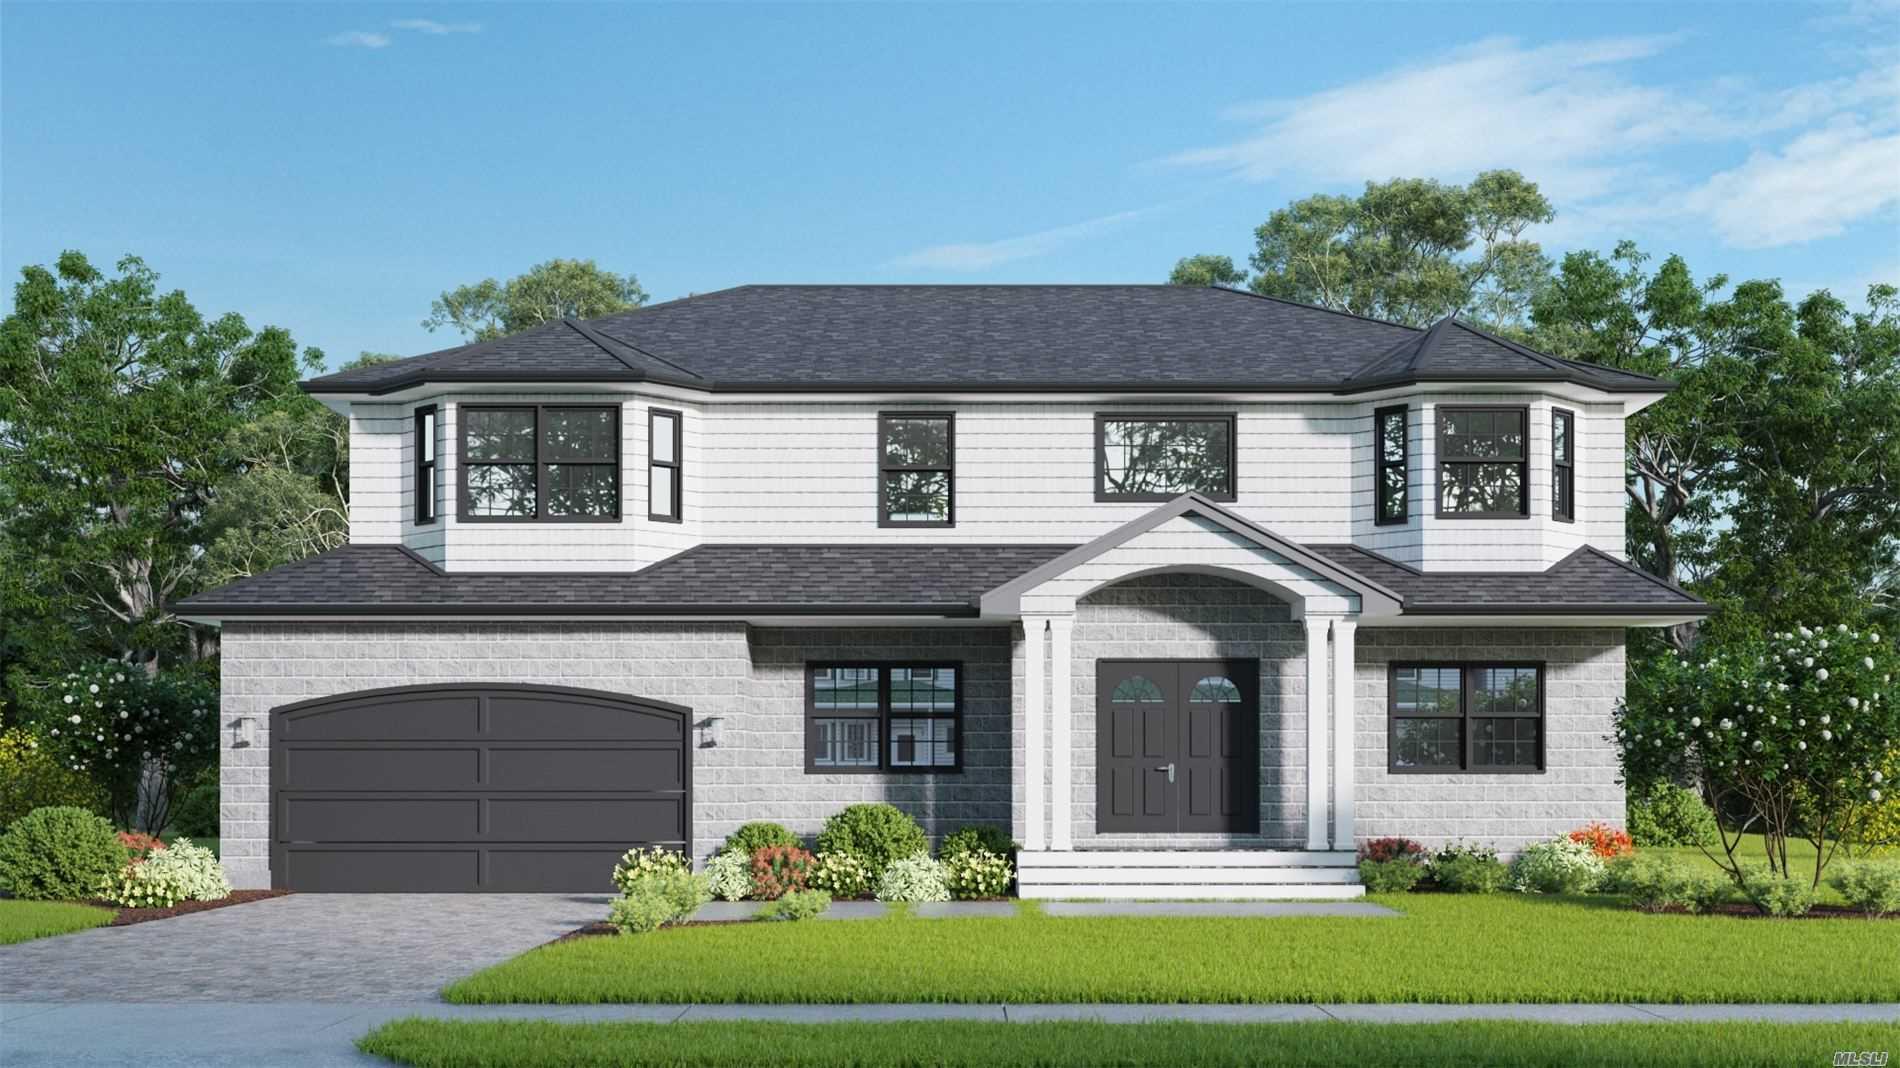 Property for sale at 31 Azalea Drive, Syosset,  New York 11791